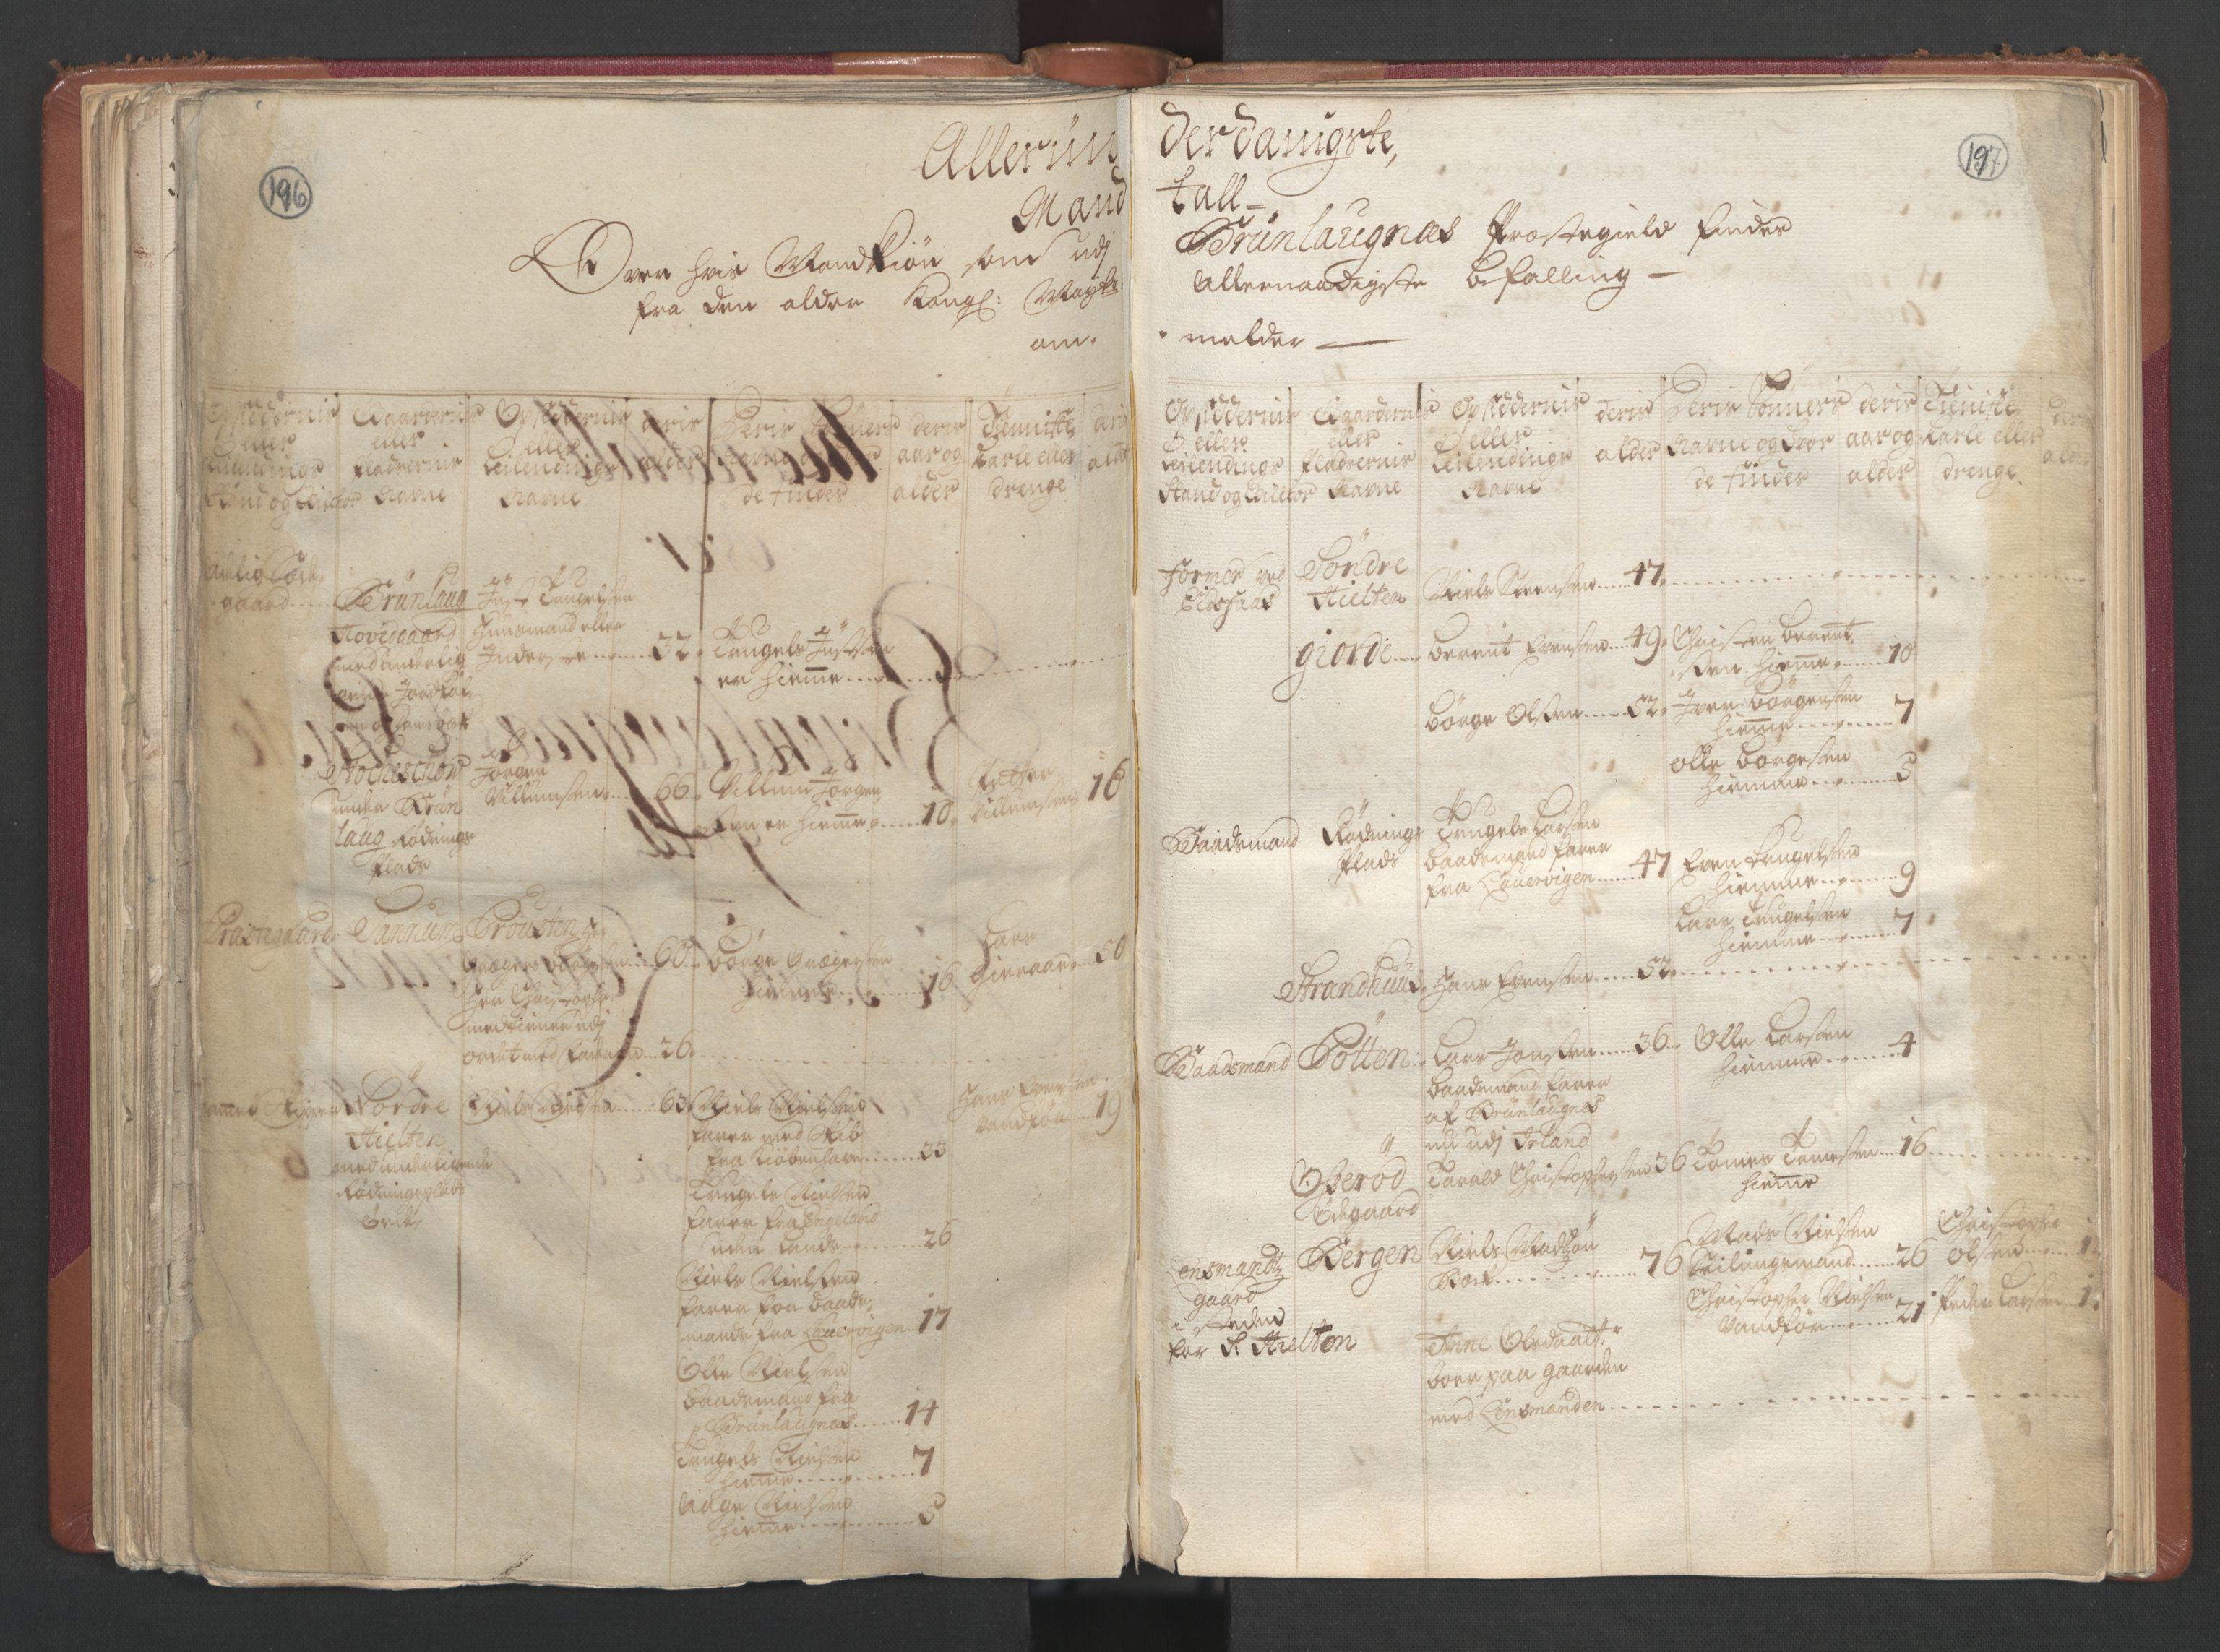 RA, Manntallet 1701, nr. 2: Solør, Odal og Østerdal fogderi og Larvik grevskap, 1701, s. 196-197